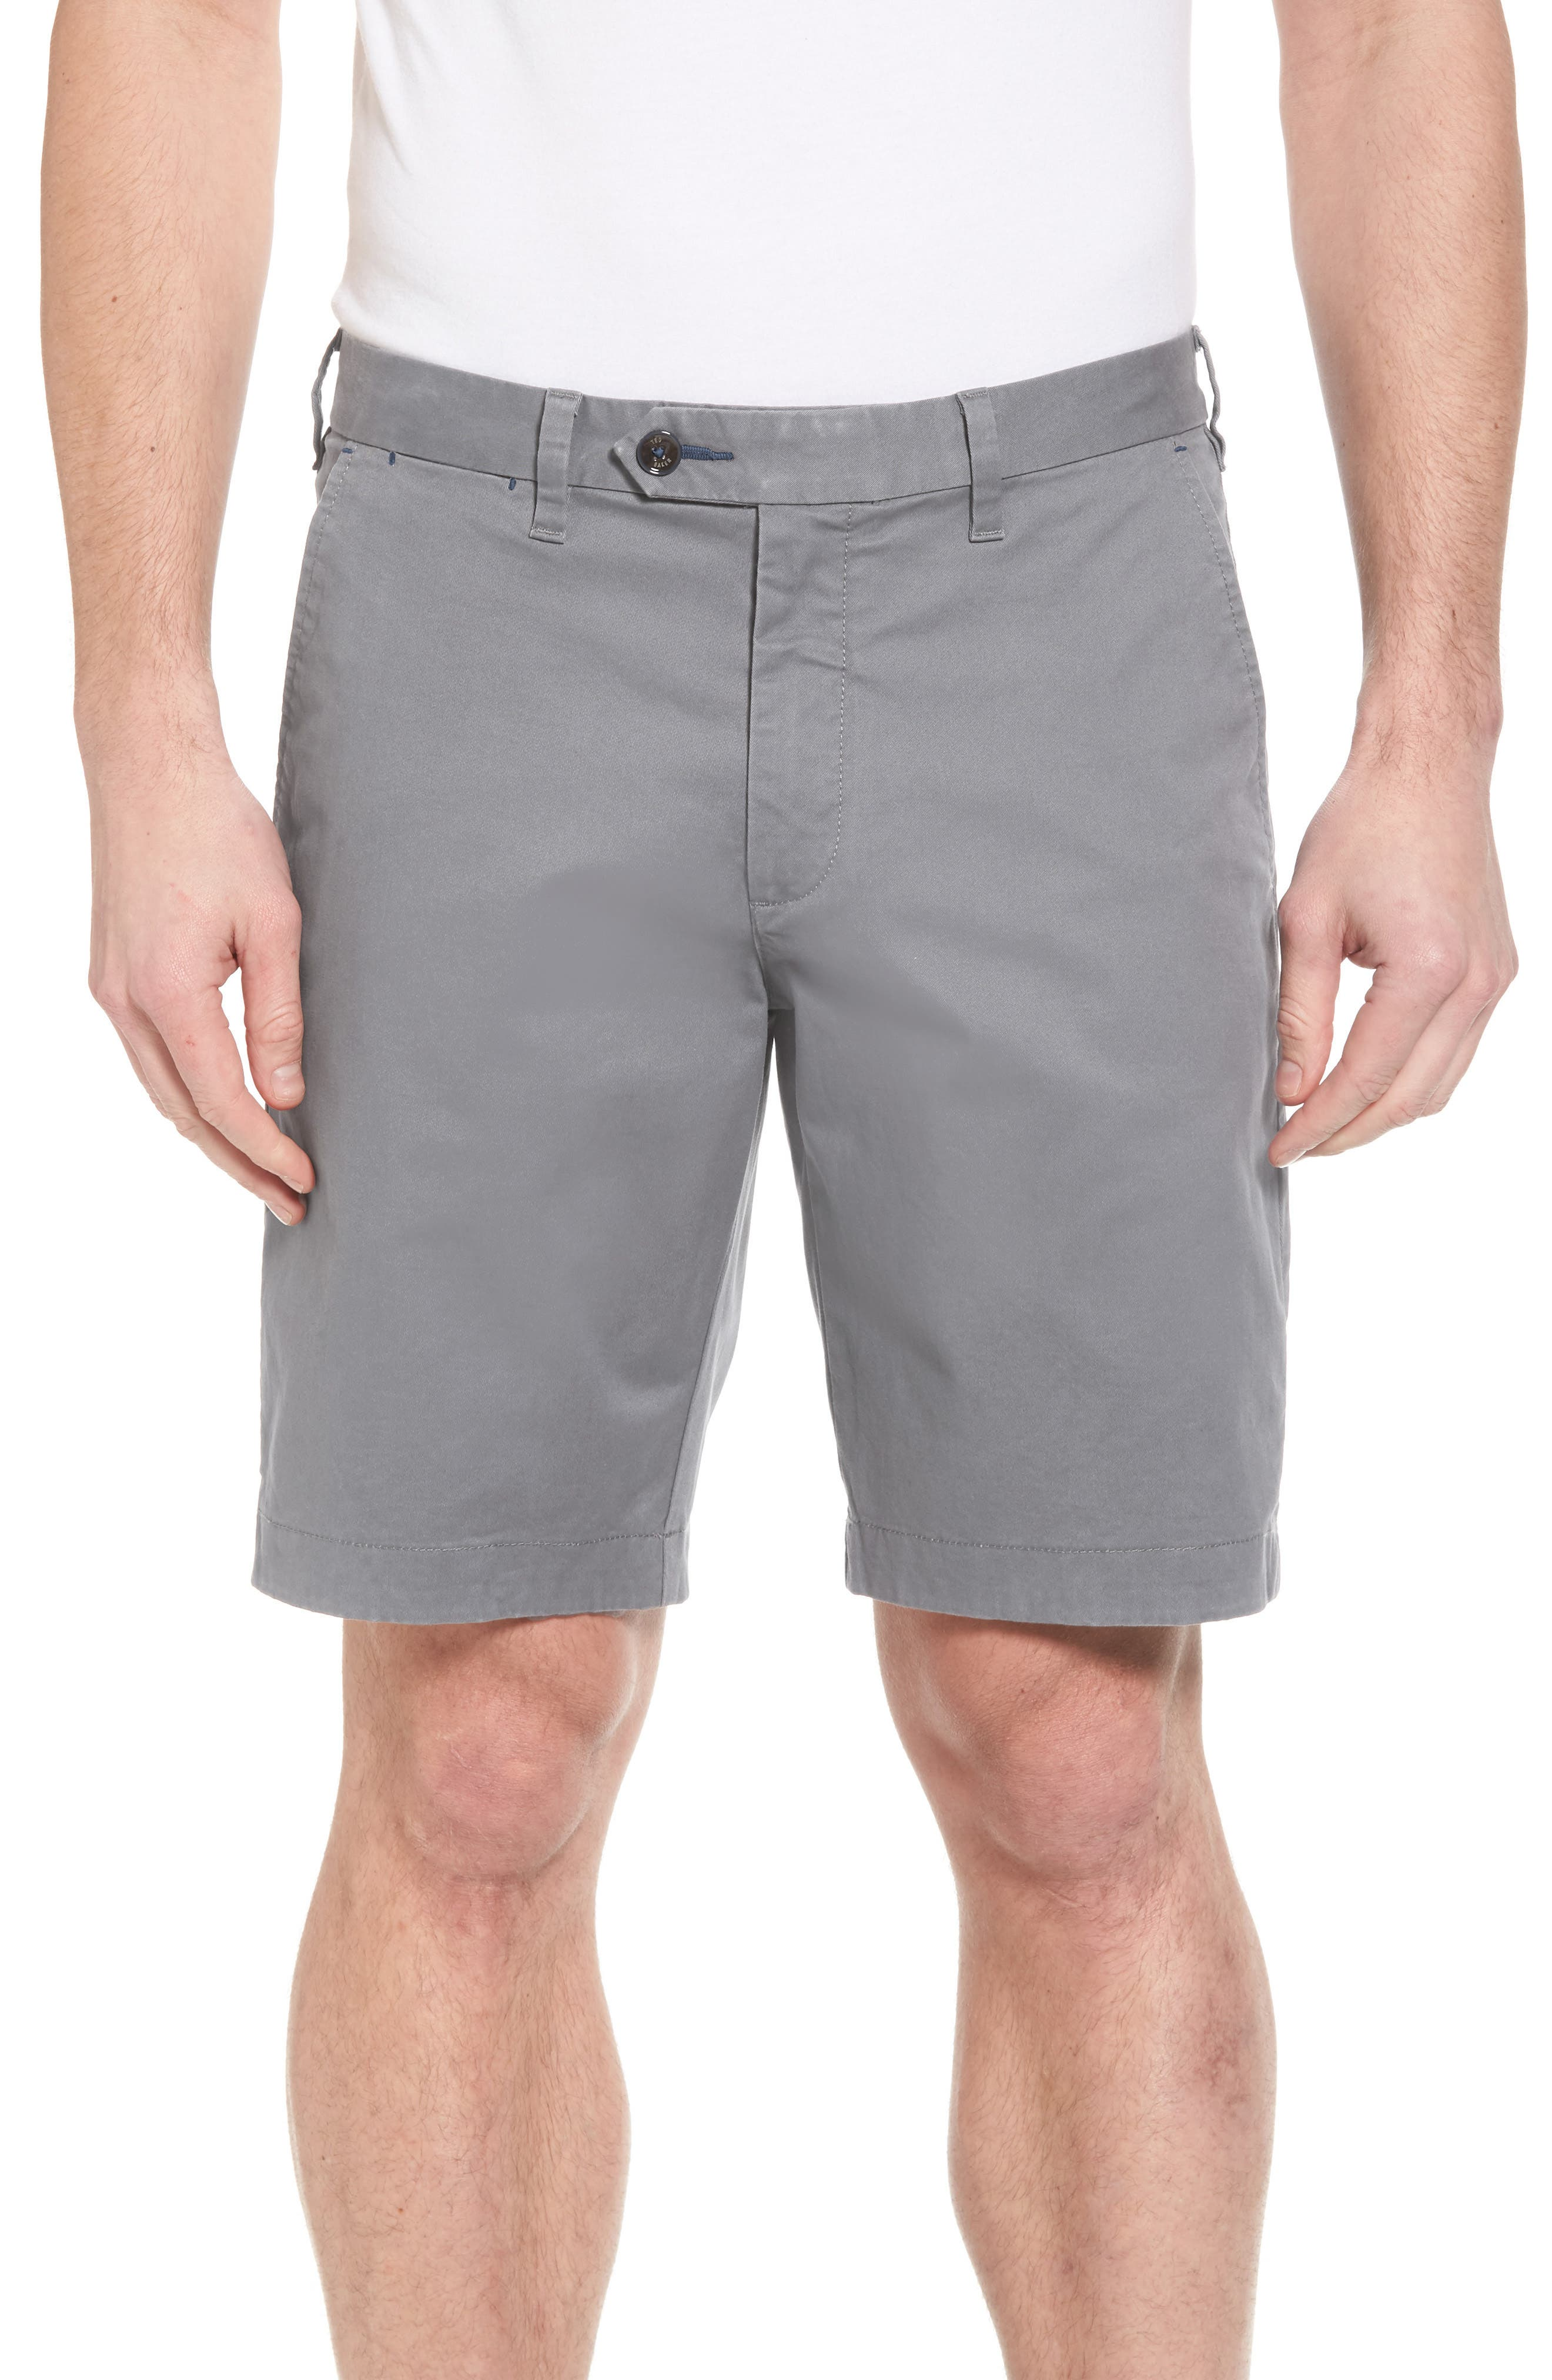 Proshor Slim Fit Chino Shorts,                             Main thumbnail 1, color,                             LIGHT GREY